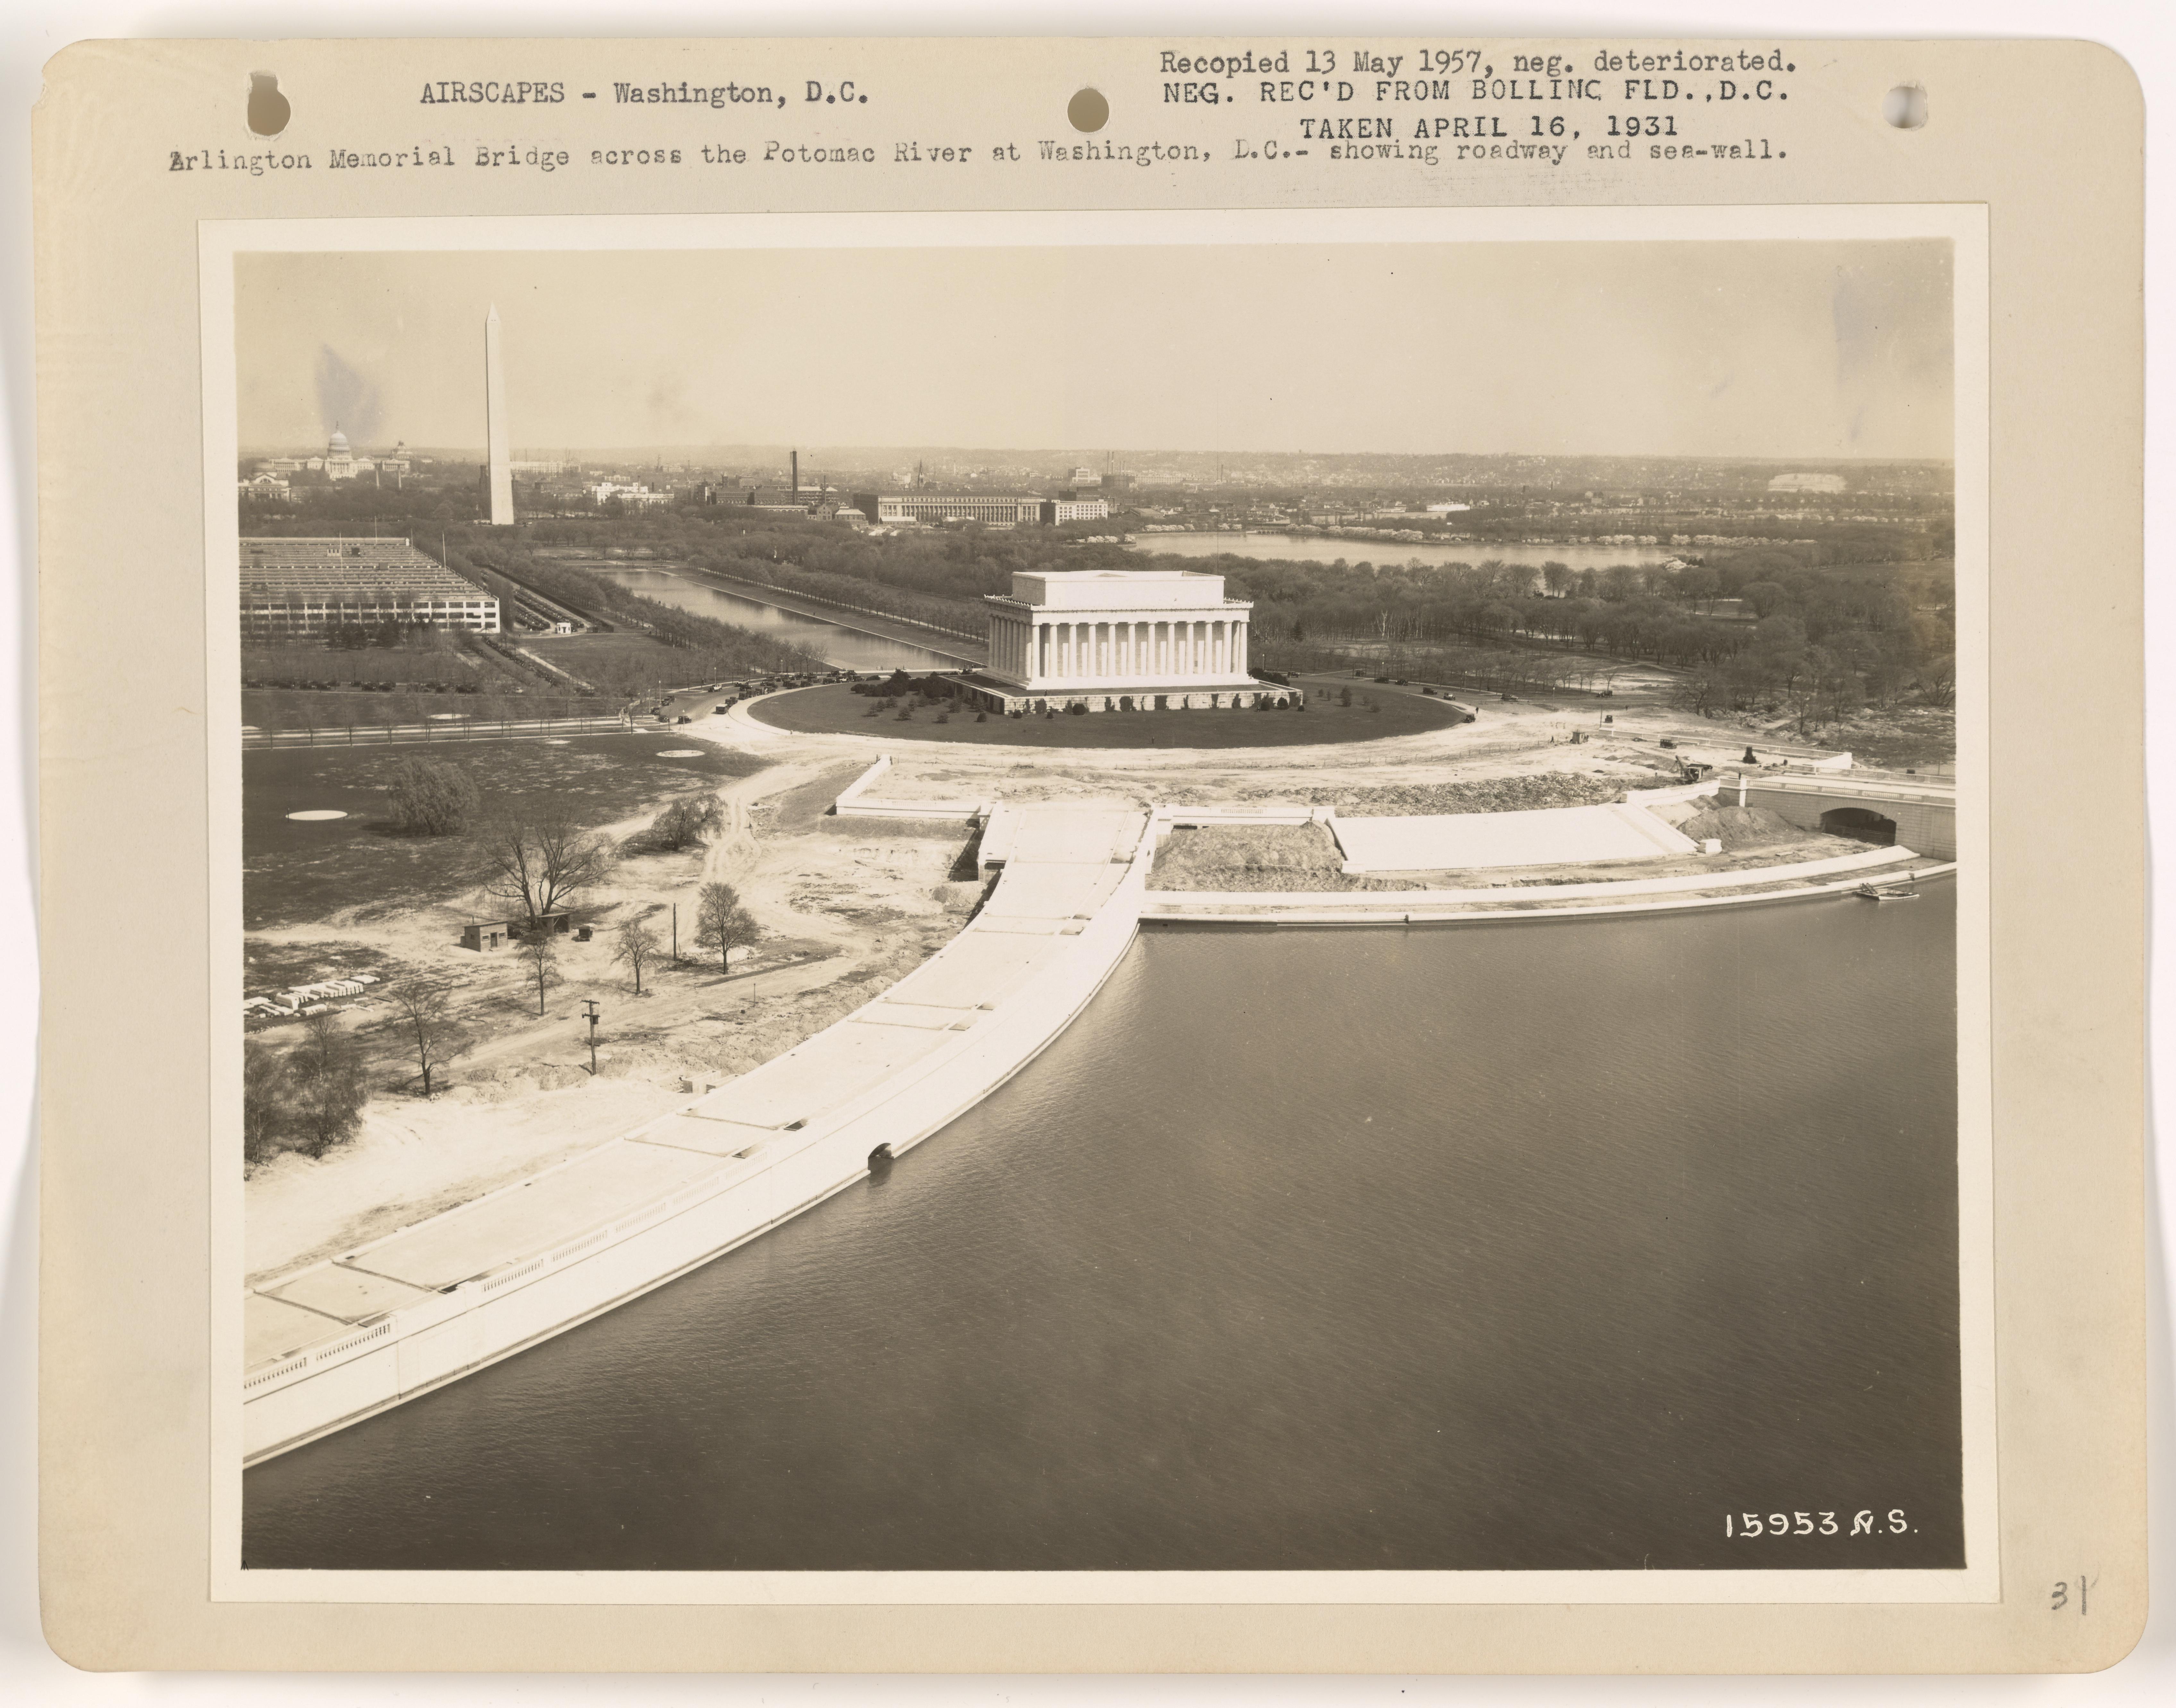 Washington D.C. - Arlington Memorial Bridge